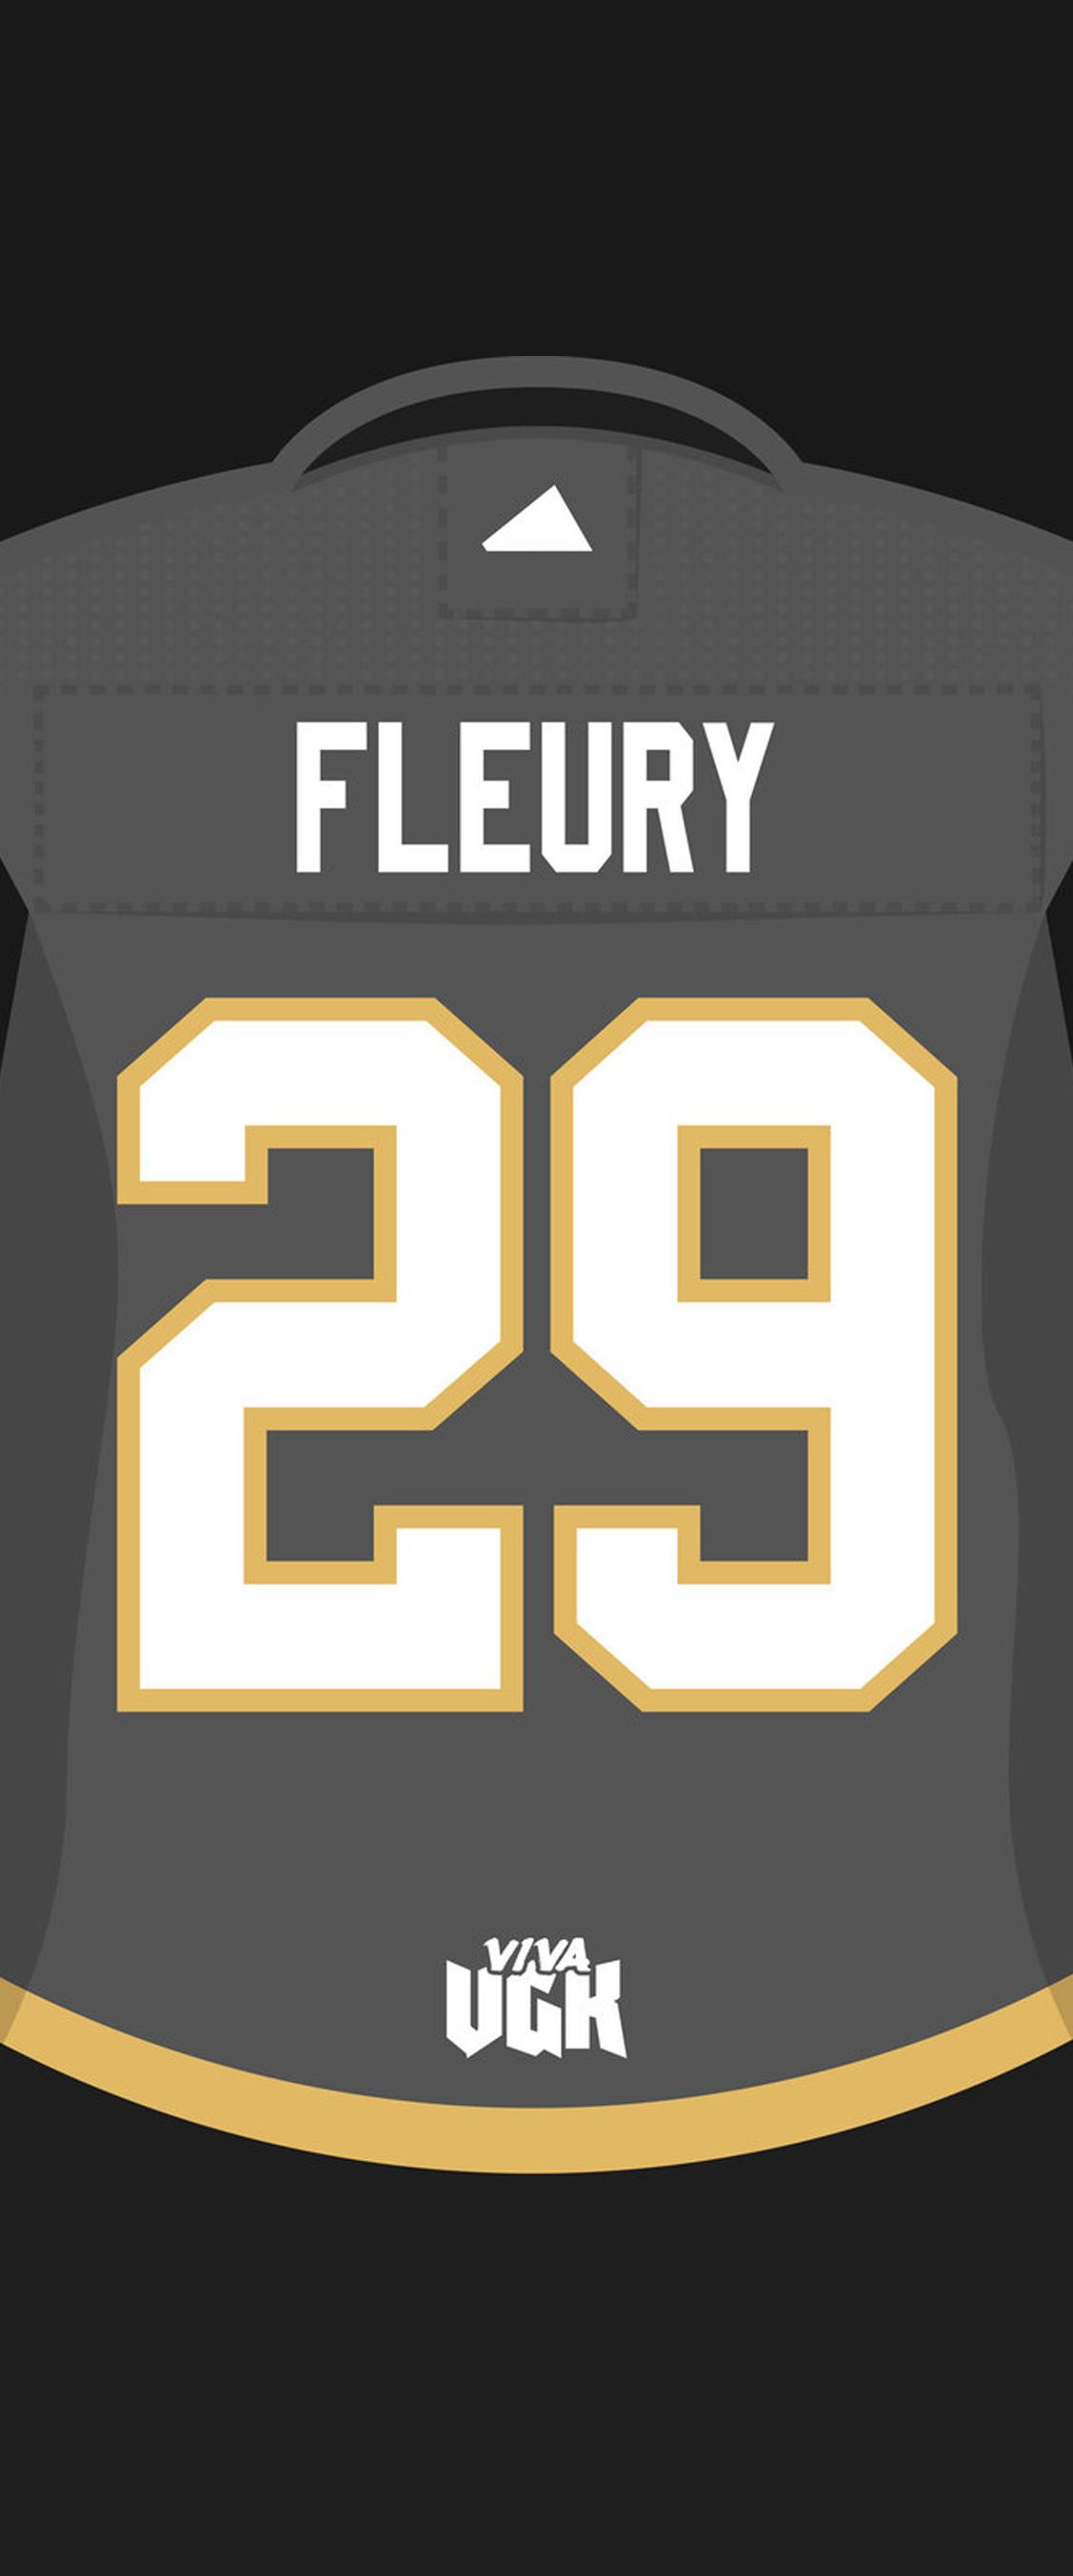 Fleury Jersey Iphone X Wallpaper By VIVA VGK goldenknights 1127x2706